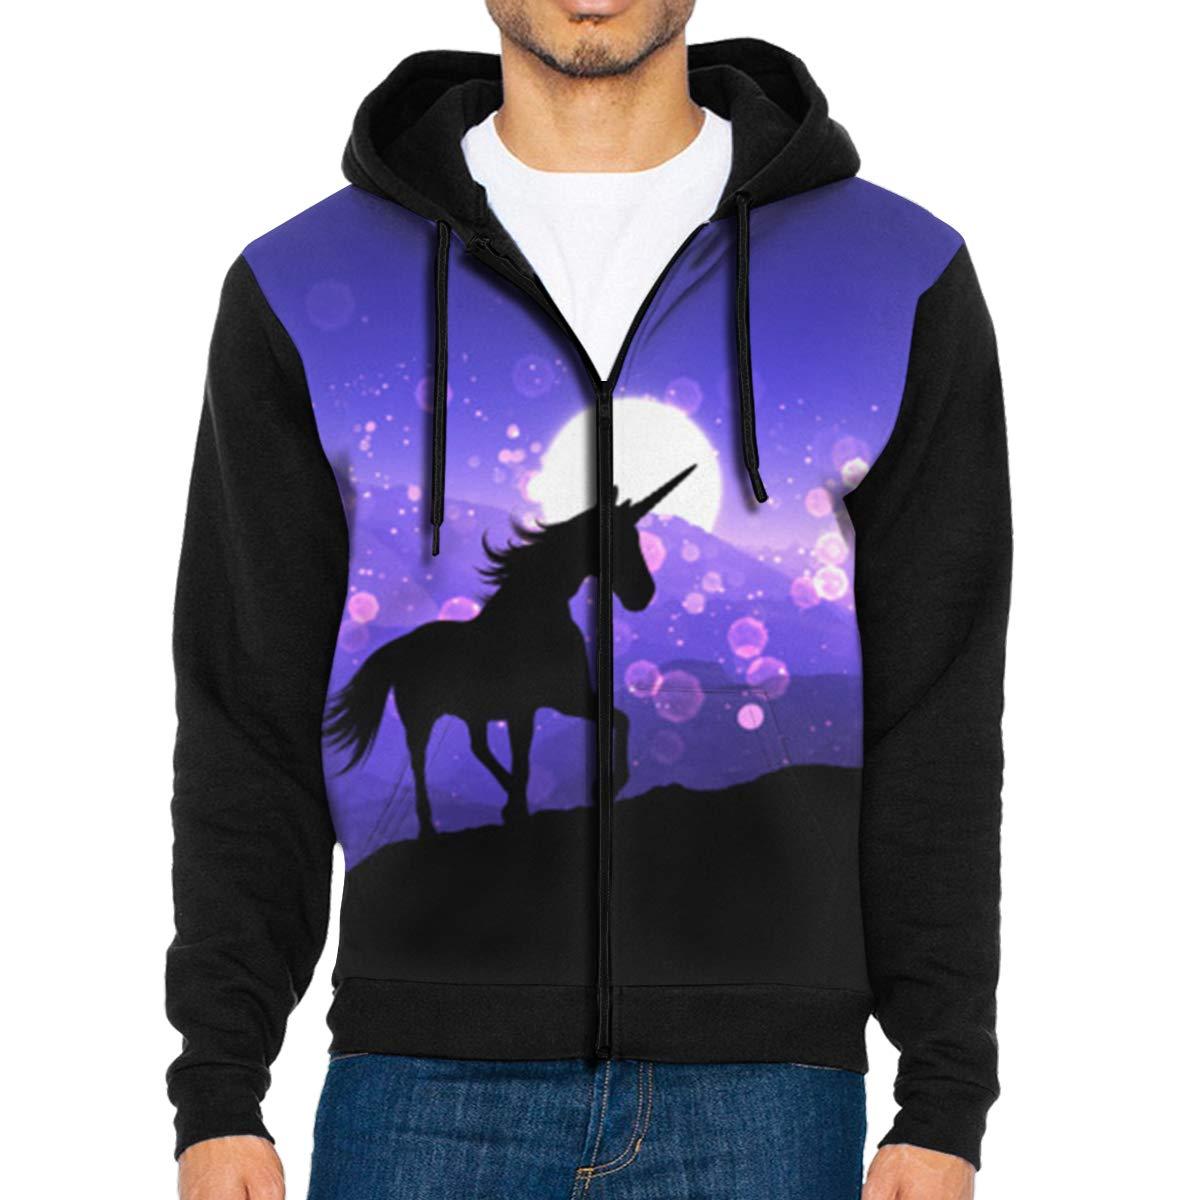 Fantasy Unicorn Purple Sunset Lanscape Lightweight Mans Jacket with Hood Long Sleeved Zippered Outwear